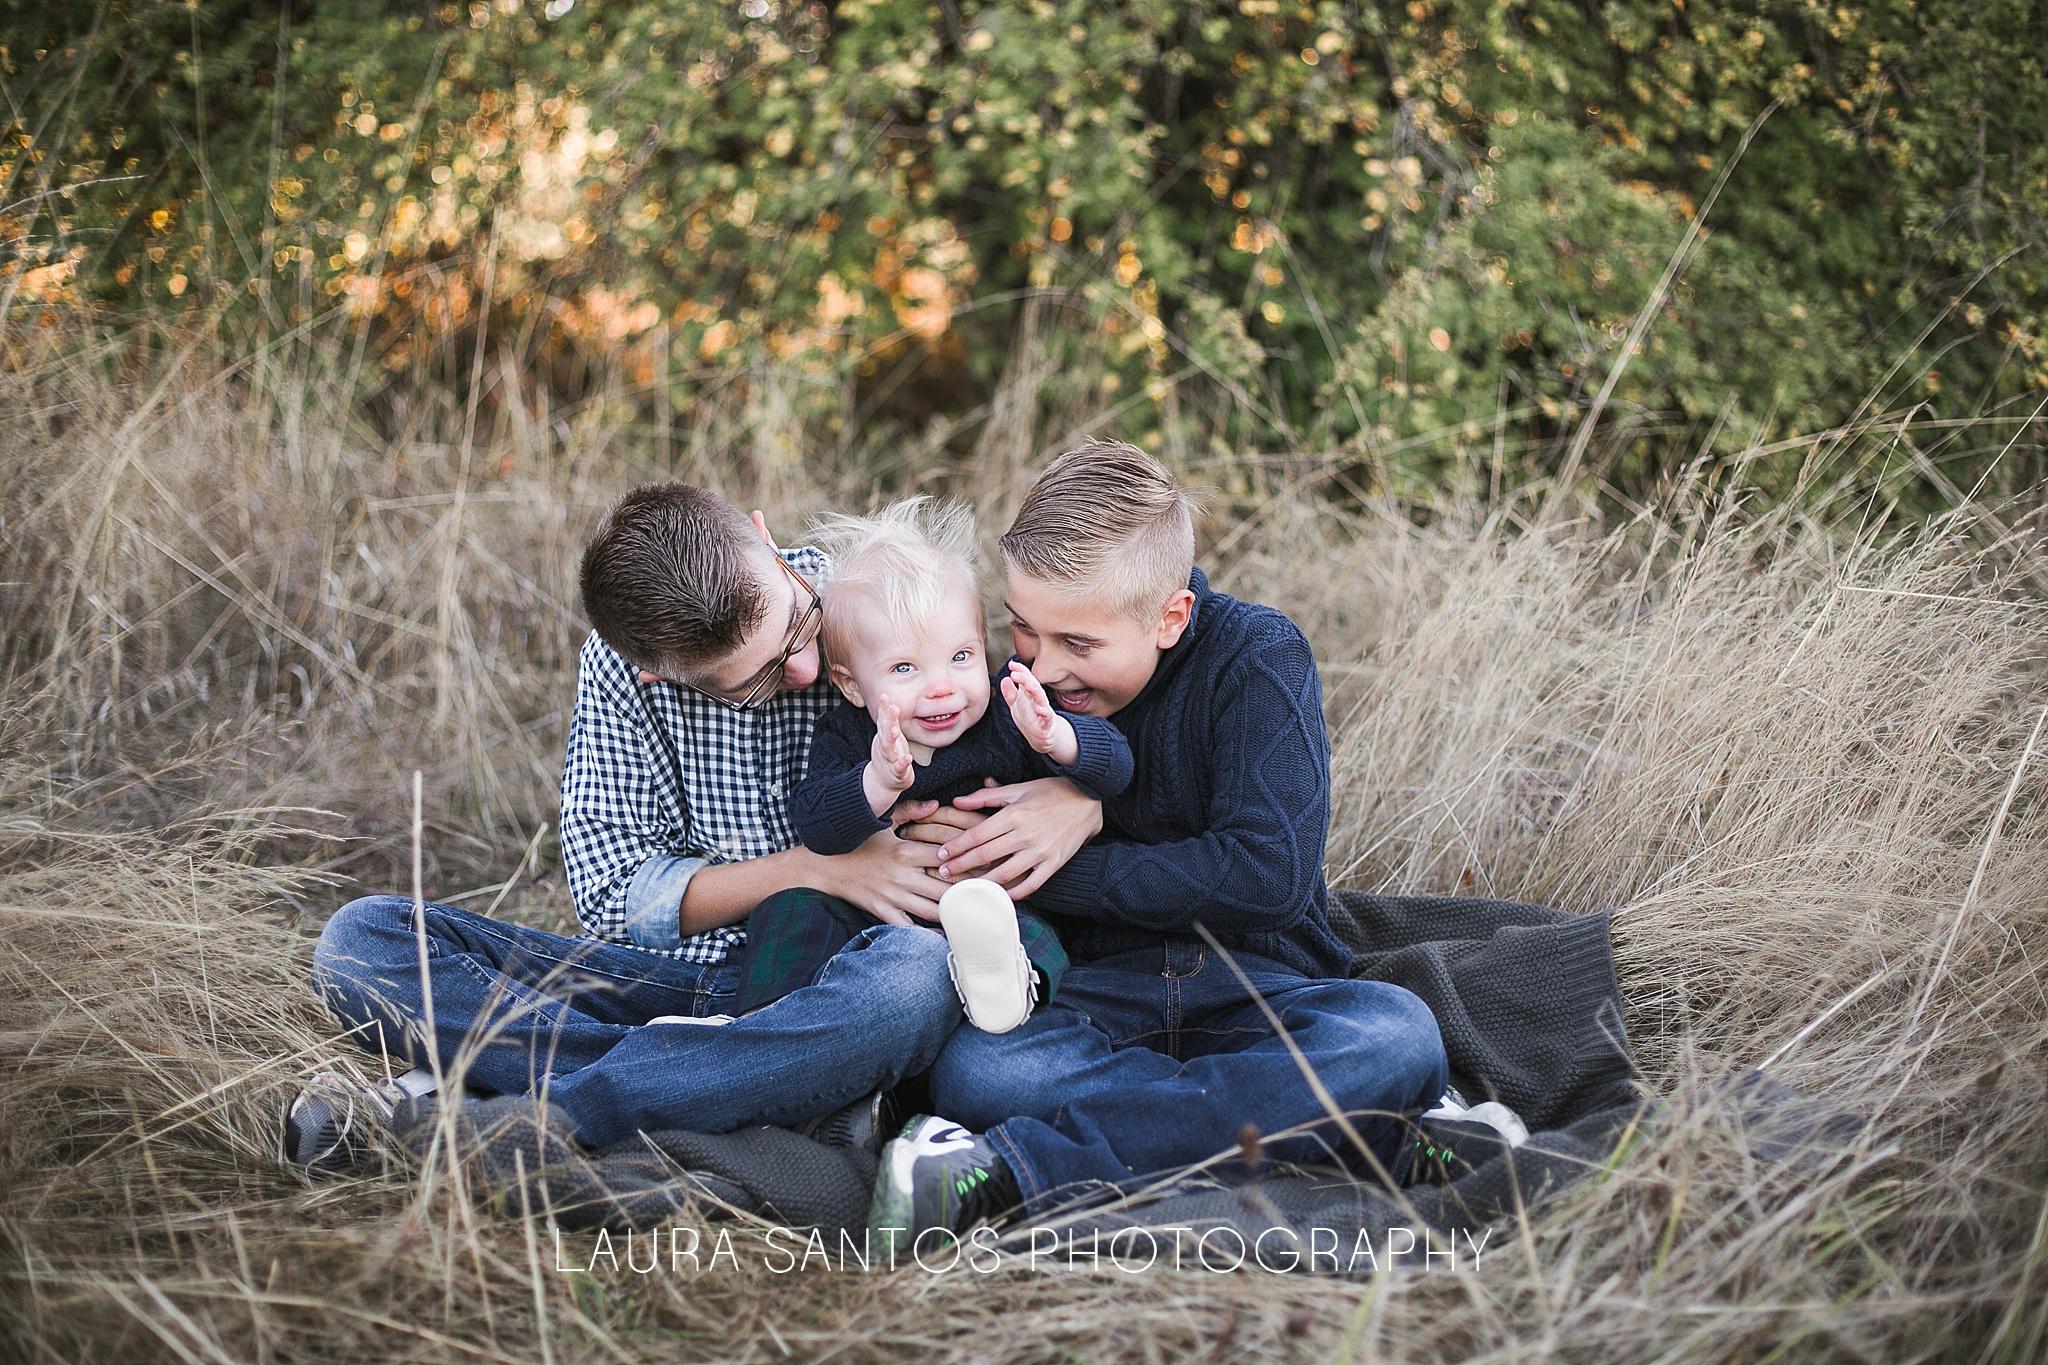 Laura Santos Photography Portland Oregon Family Photographer_0615.jpg